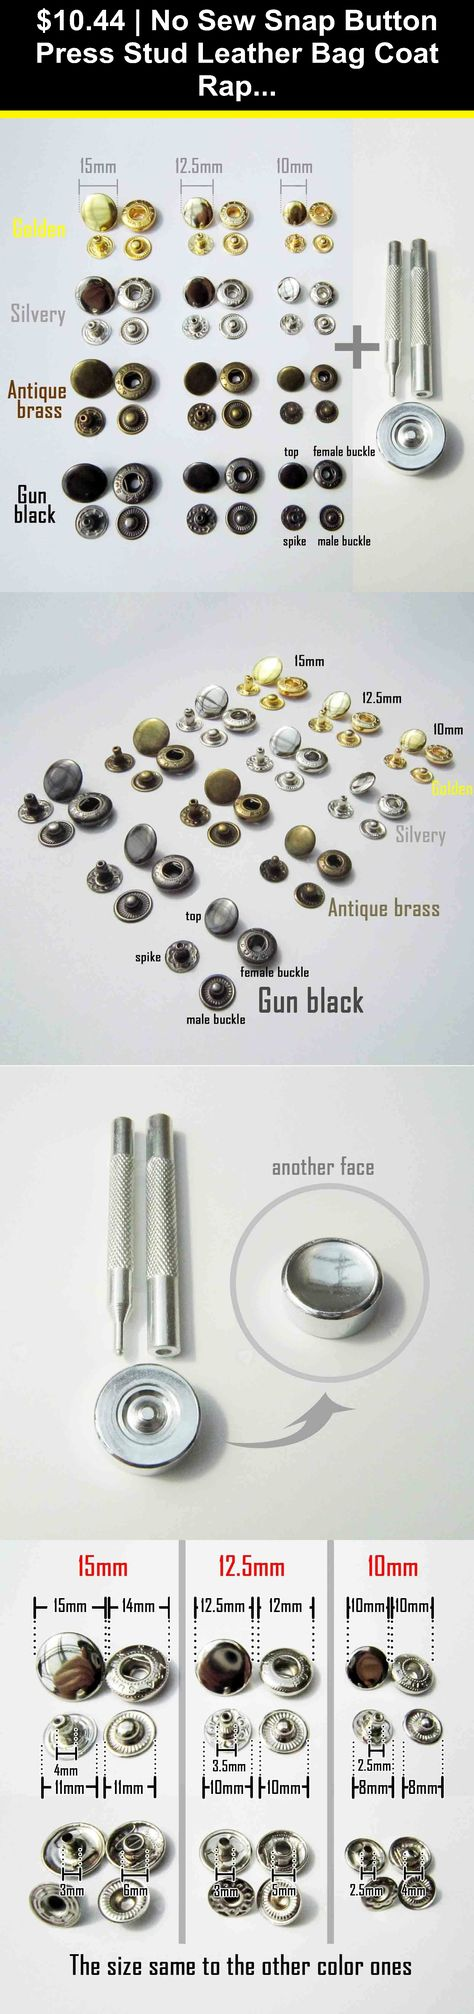 No Sew Snap Button Press Stud Leather Bag Coat Popper Rivet Fastener Repair Tool